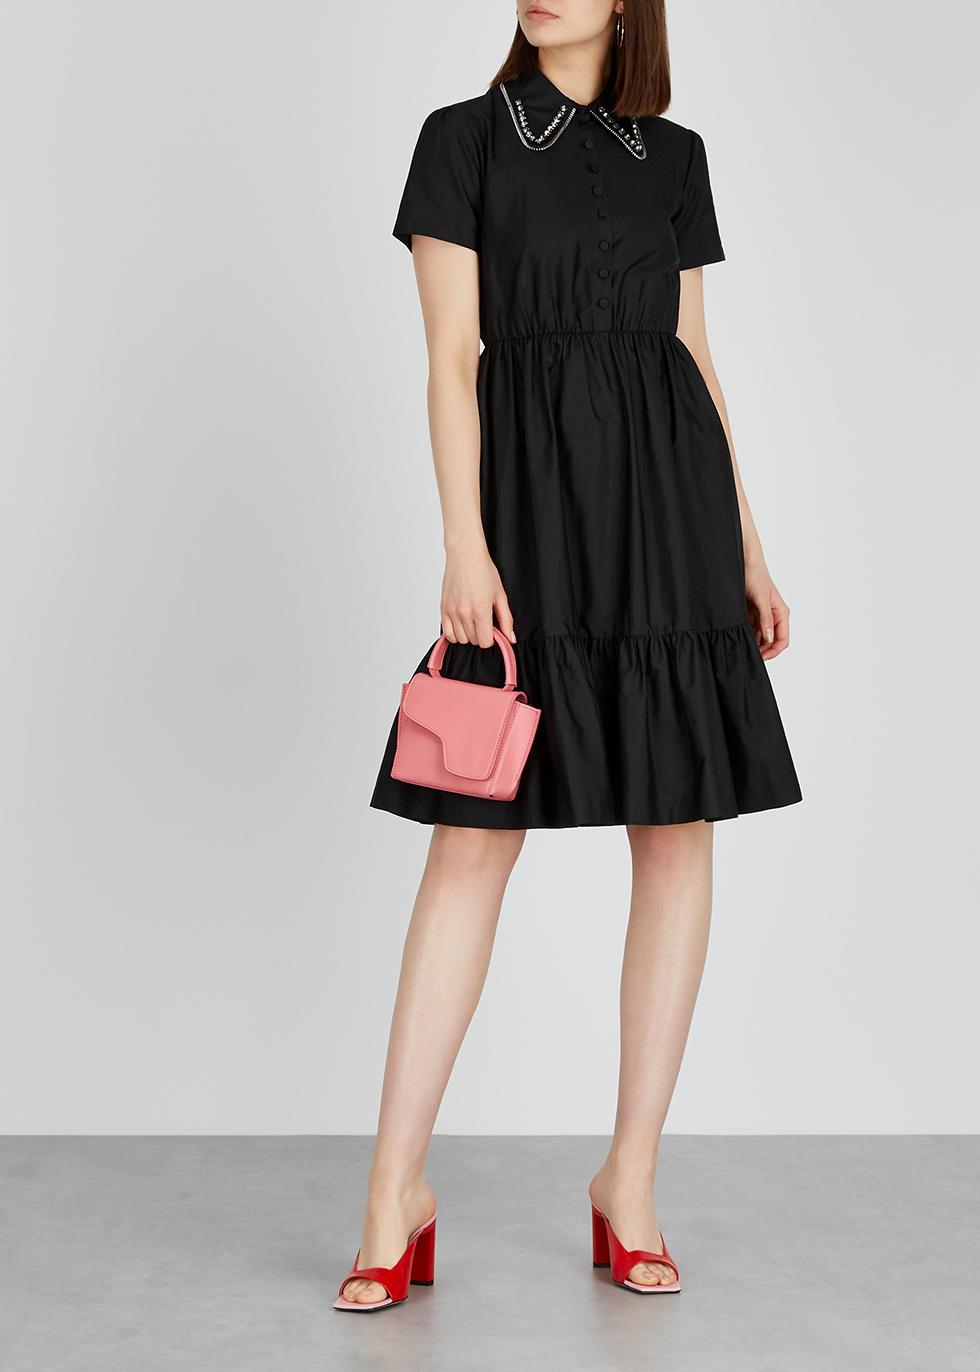 cd79e2f0da5e Designer Dresses & Designer Gowns - Harvey Nichols